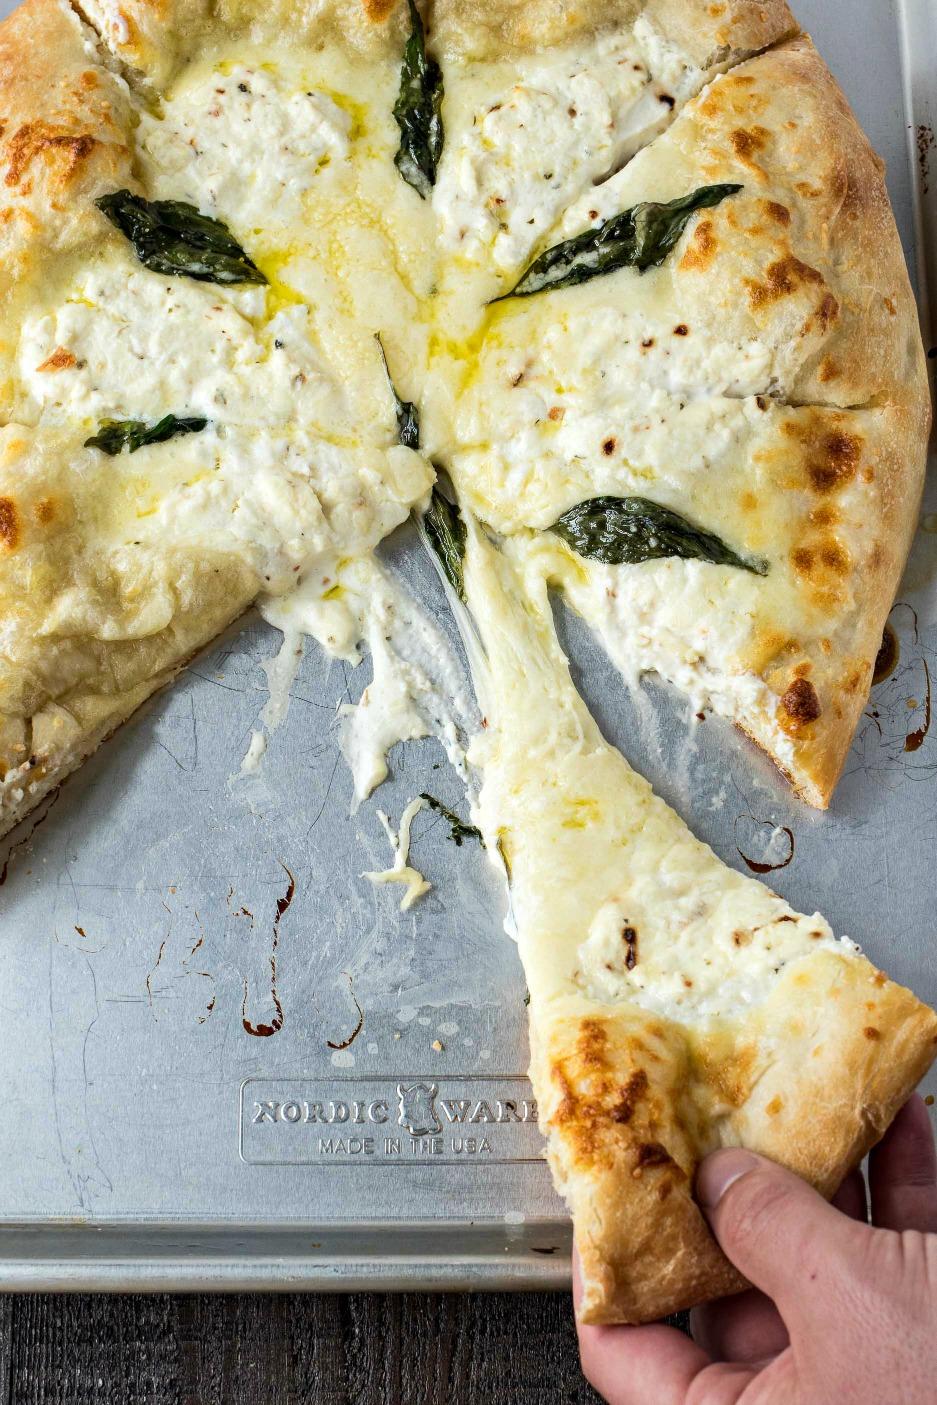 The Best Pizza Bianca White Pizza Cpa Certified Pastry Aficionado